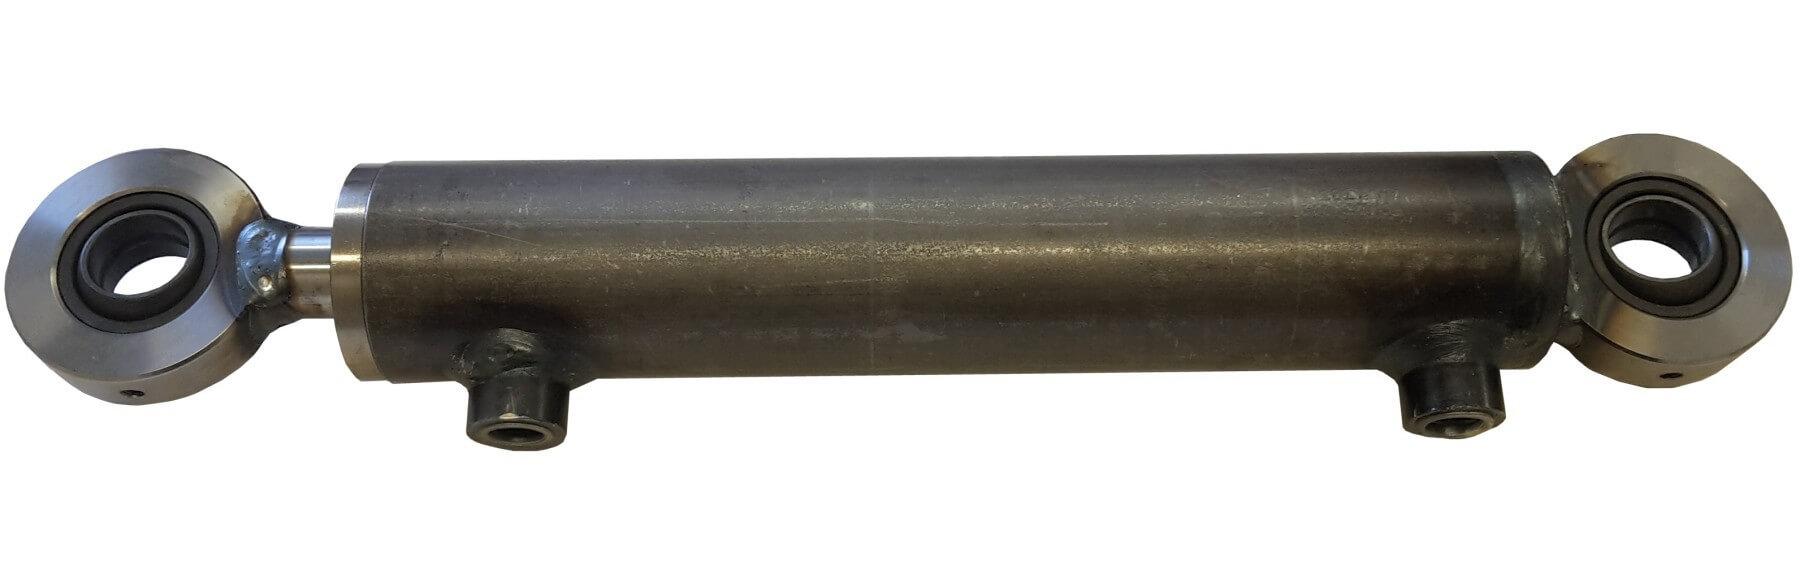 Hydraulisylinteri CL 100. 60. 400 GE